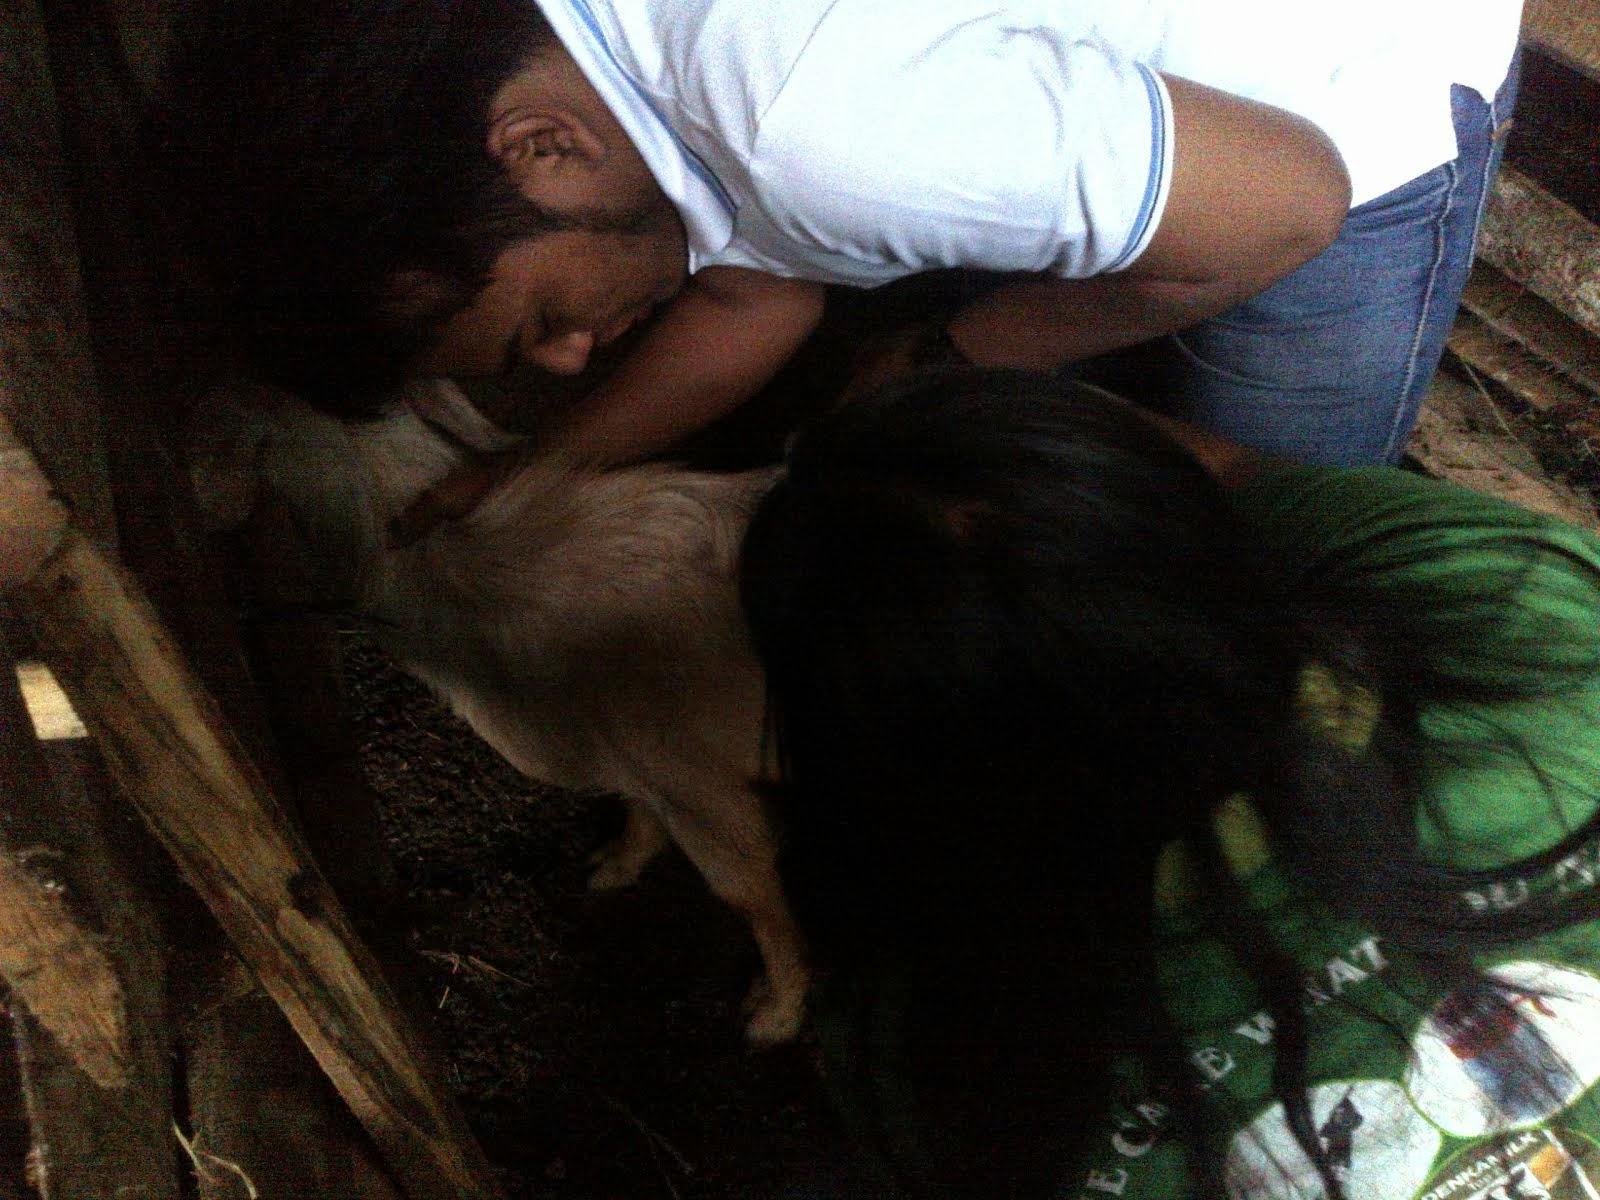 Kunjungan Penanganan Kesehatan Kambing-Domba tgl 28 September 2013